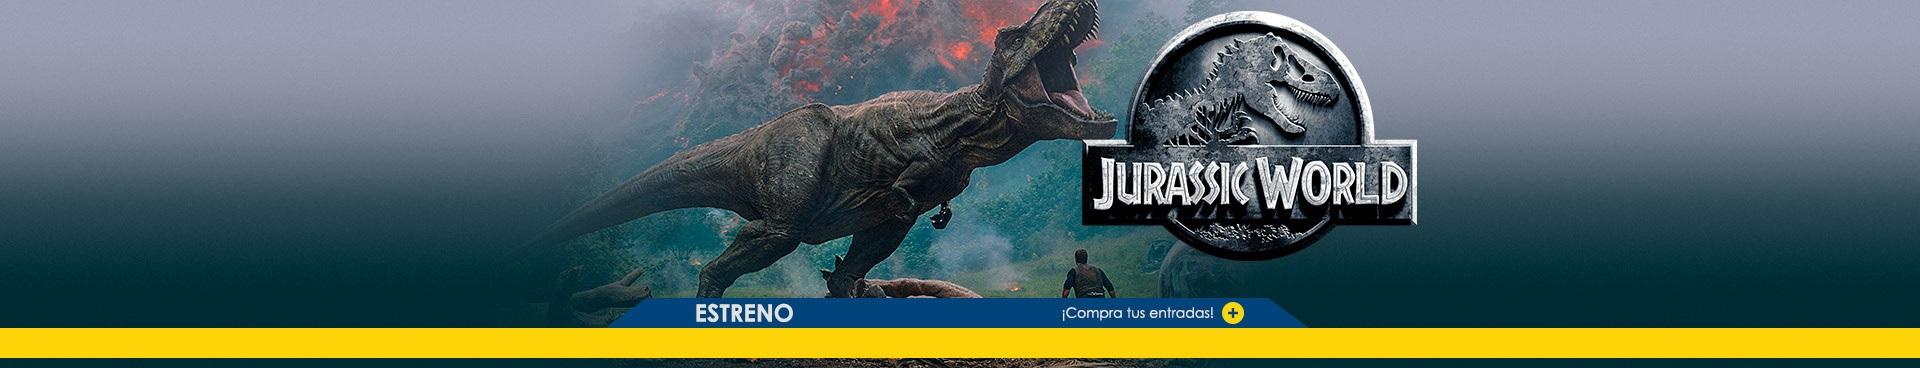 Estreno Jurassic World